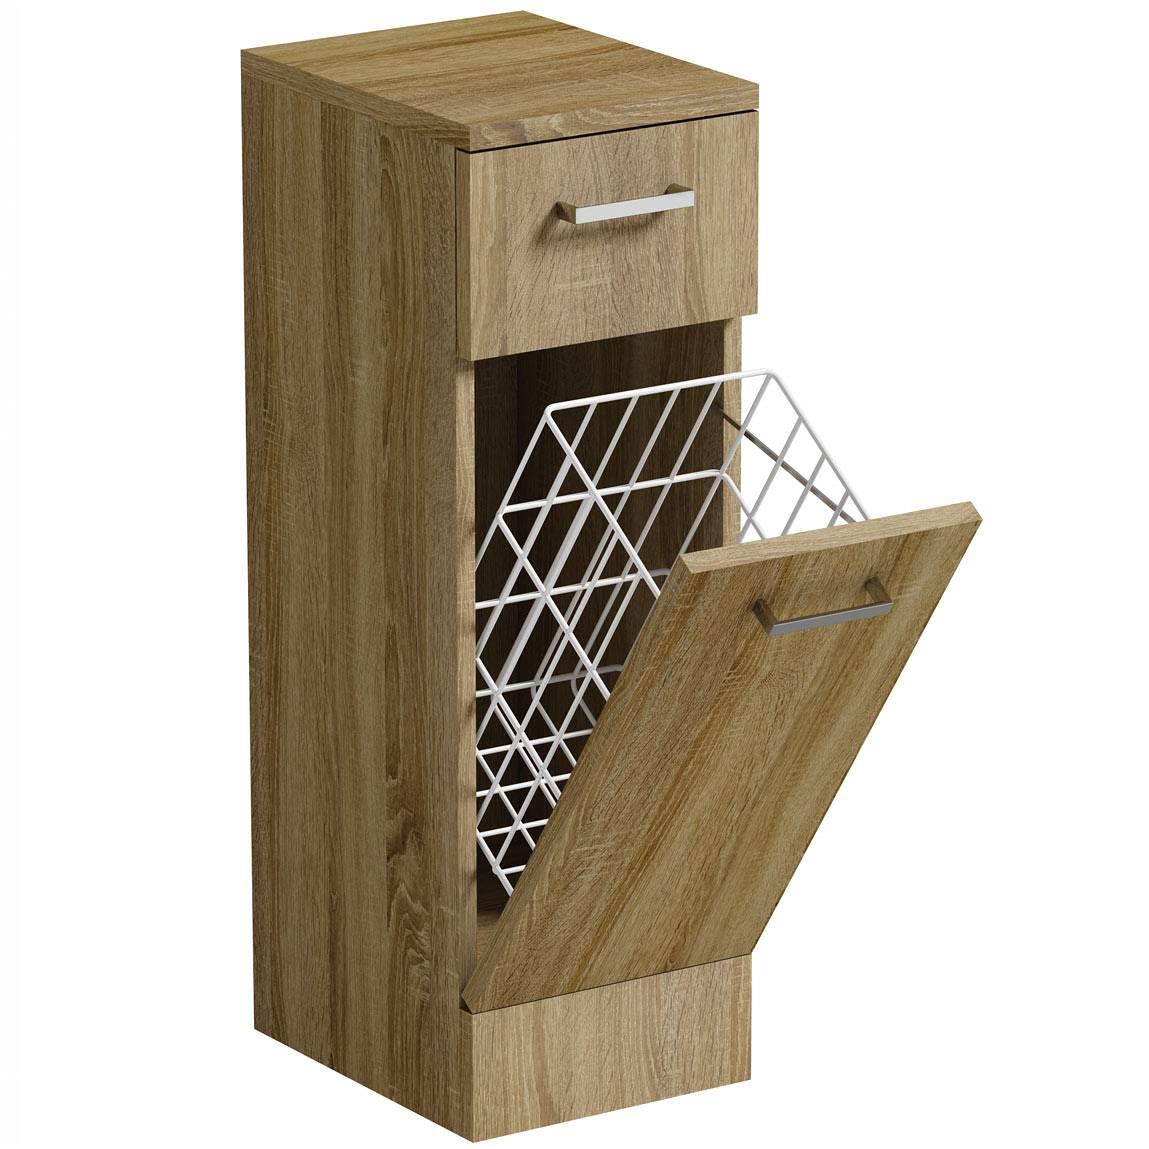 Image of Sienna Oak Linen Basket 300